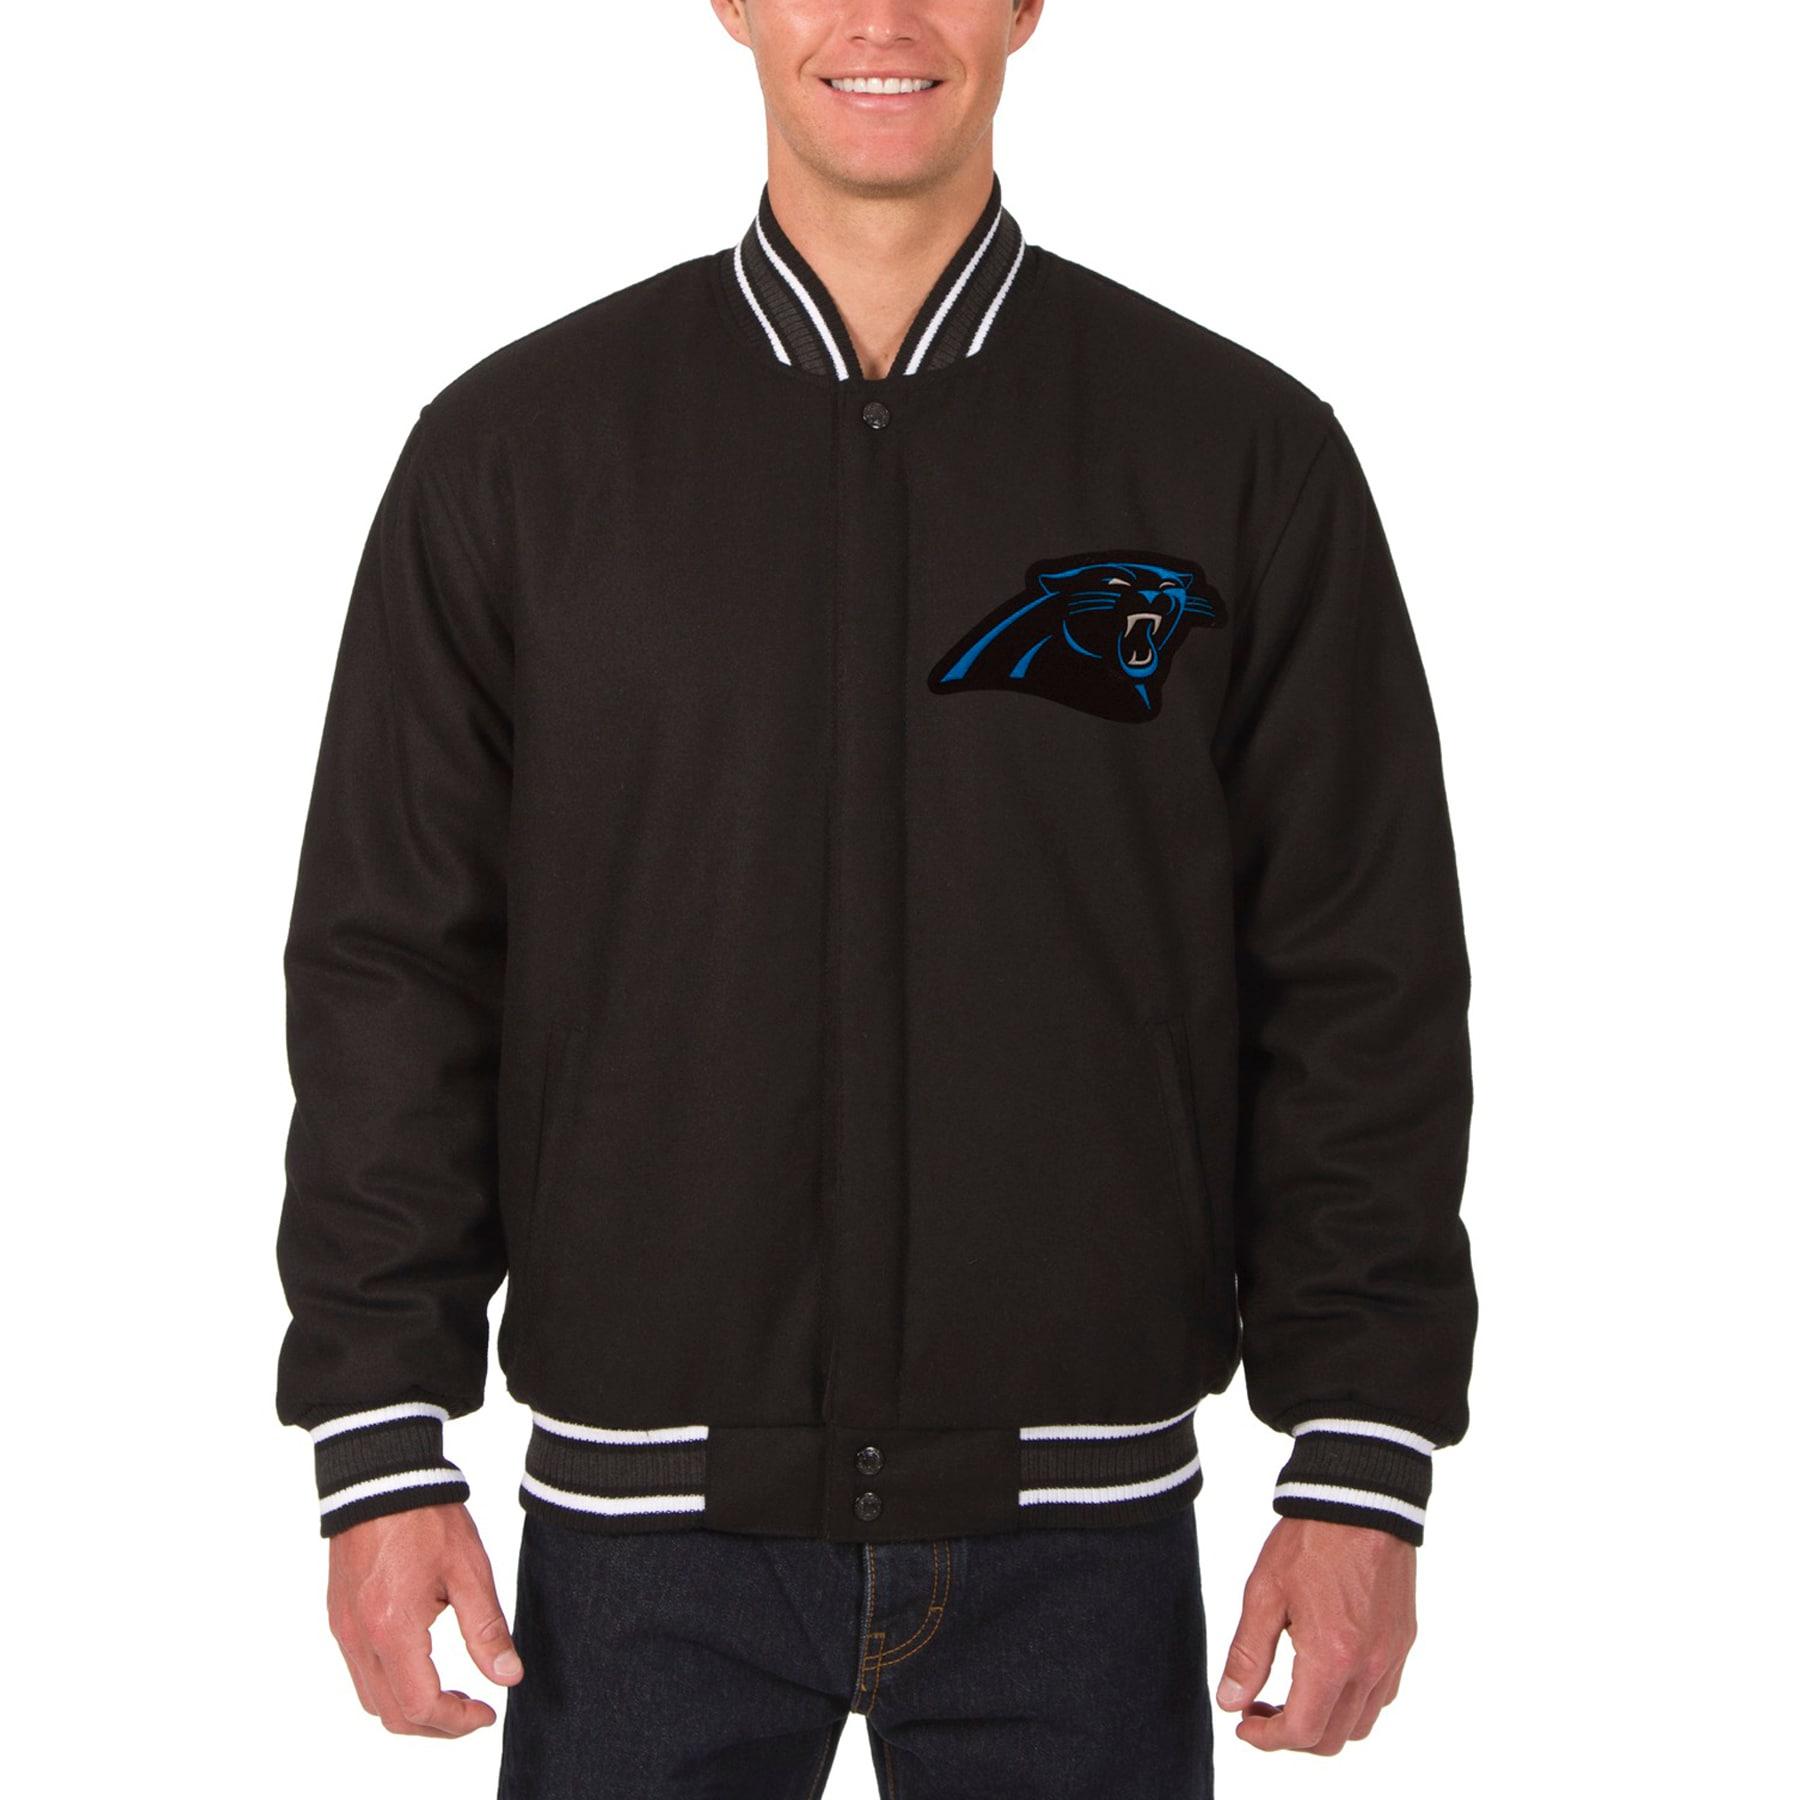 Carolina Panthers JH Design Wool Reversible Jacket with Embroidered Logos - Black